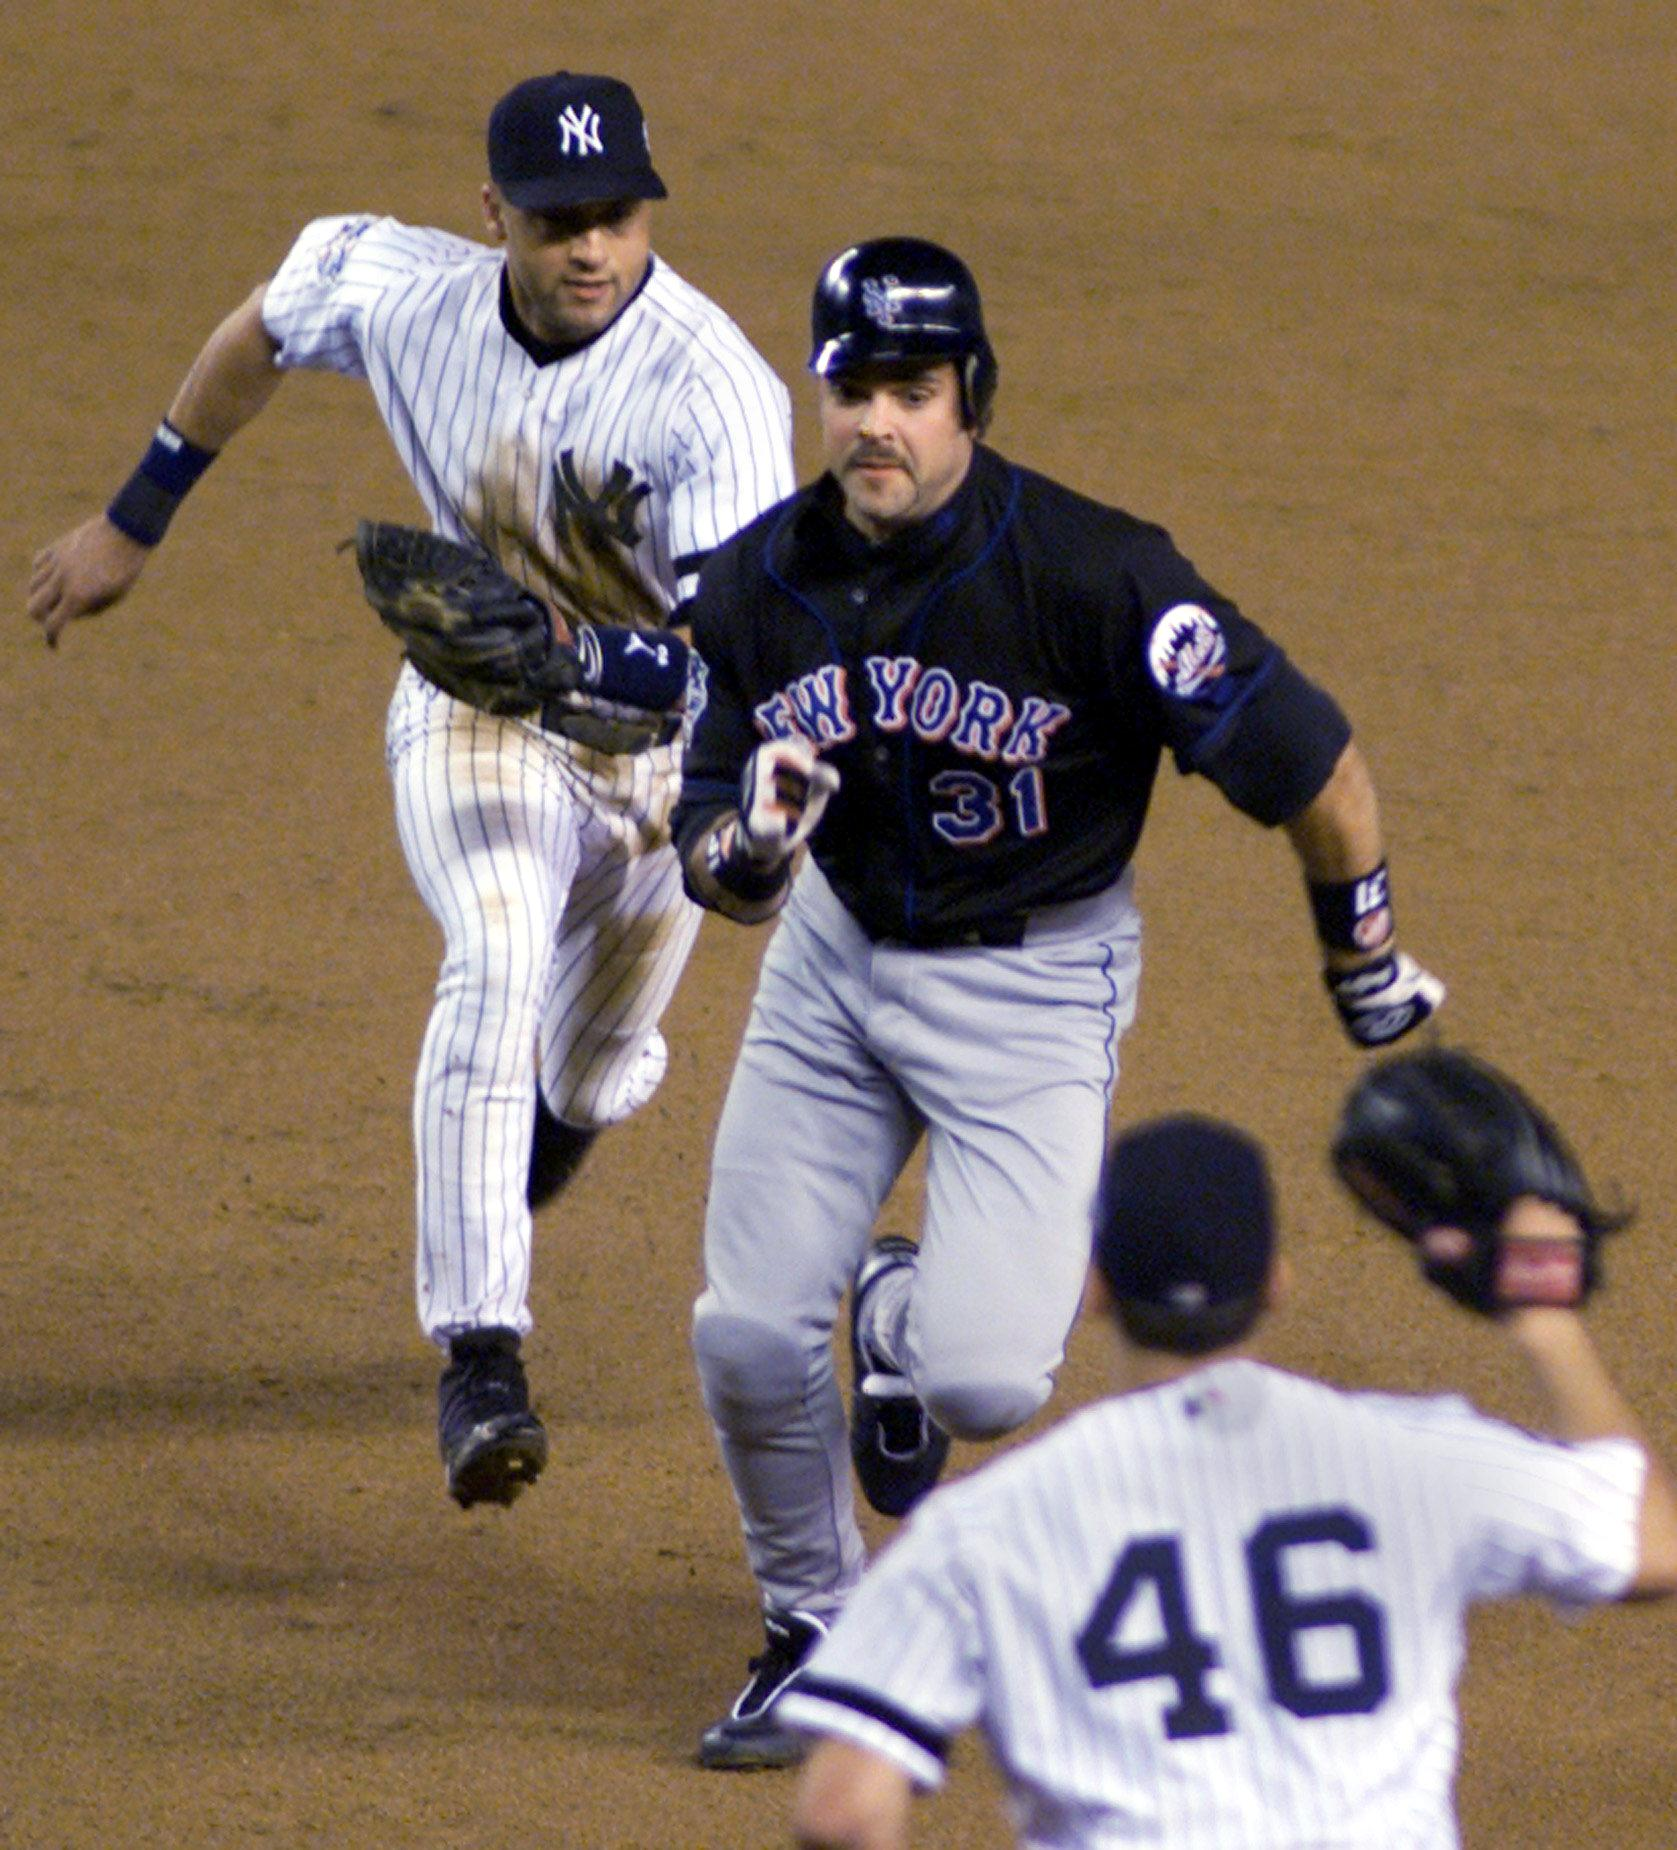 Major League Baseball releases 2021 schedule early - The Boston Globe